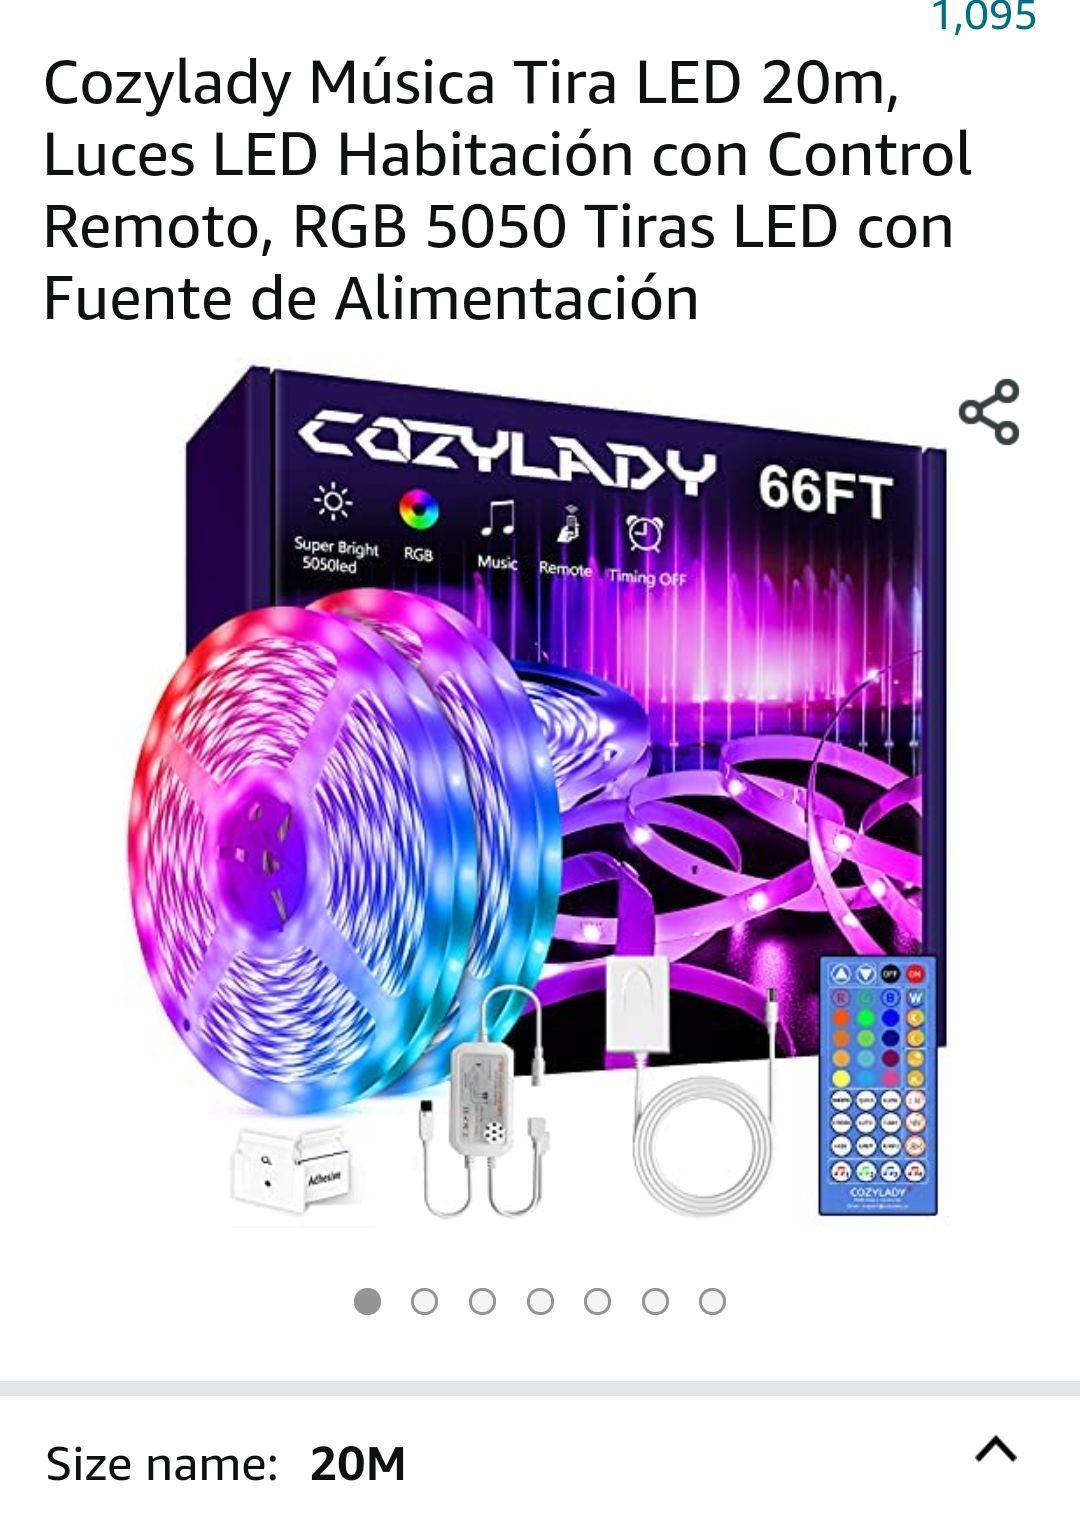 Amazon Cozylady Música Tira LED 20m, Luces LED Habitación con Control Remoto, RGB 5050 Tiras LED